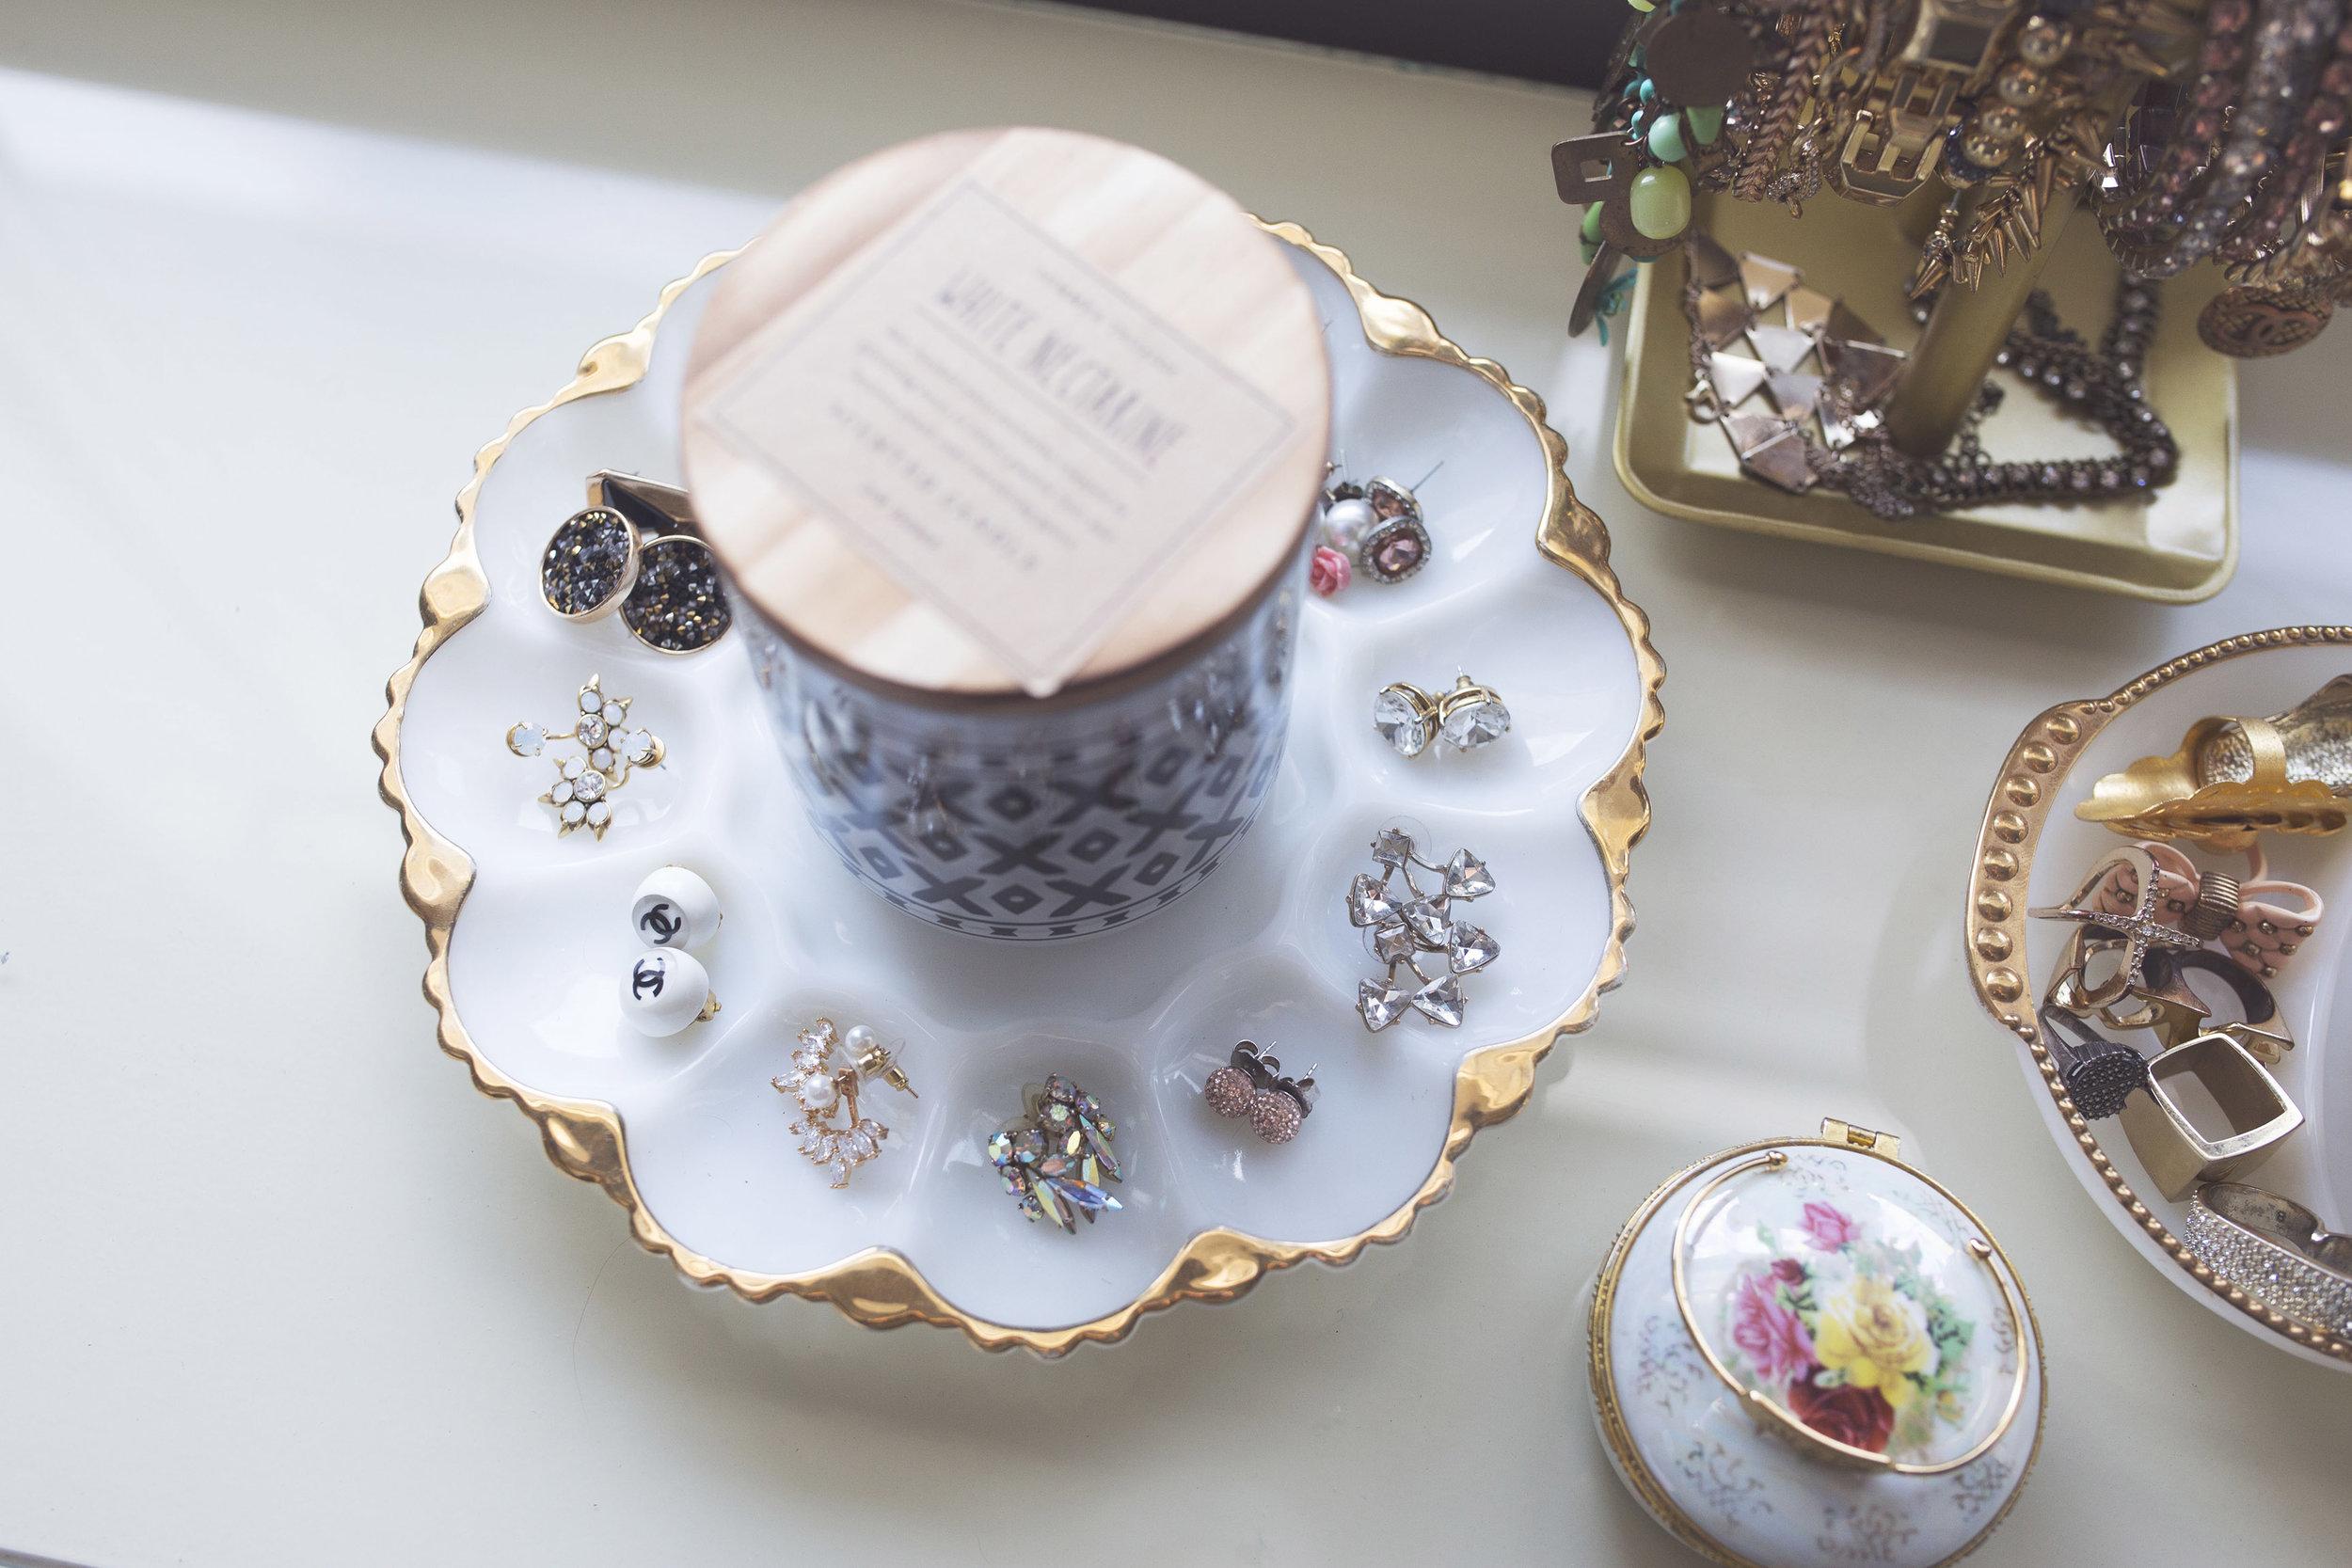 Desiree Martin jewellery storage ideas 5.jpg